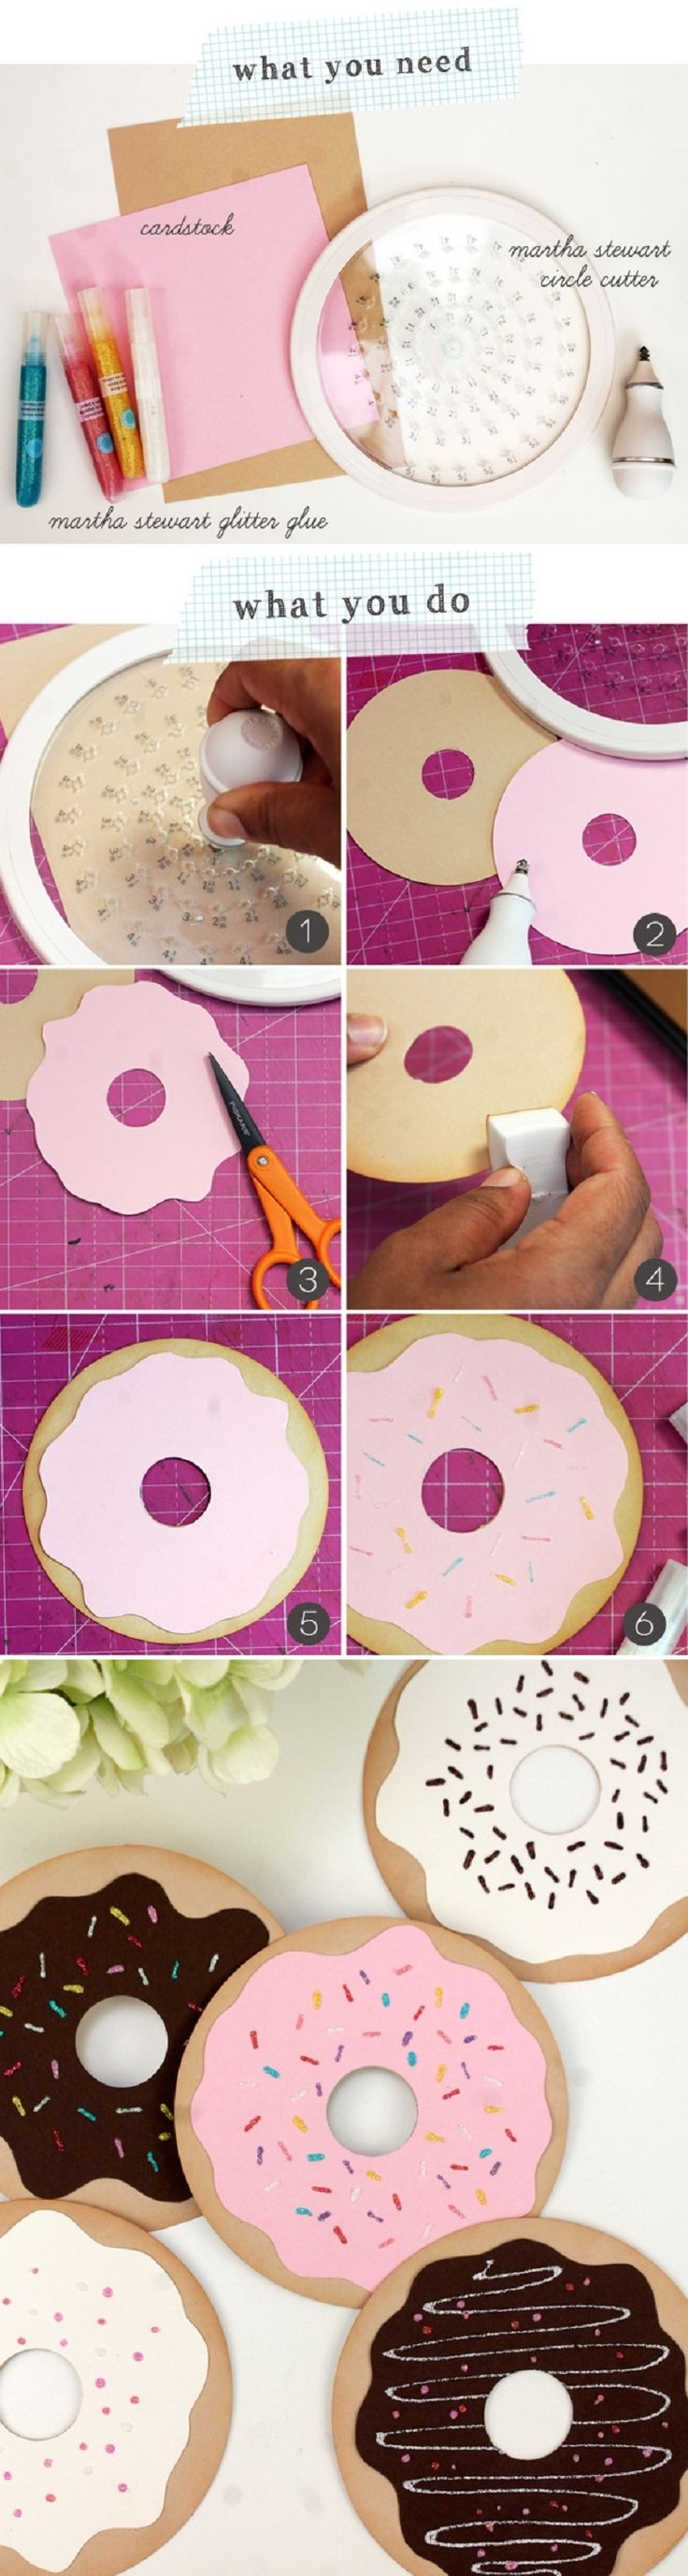 DIY Paper Donut Valentines - 15 Most PINteresting DIY Paper Decorations   GleamItUp